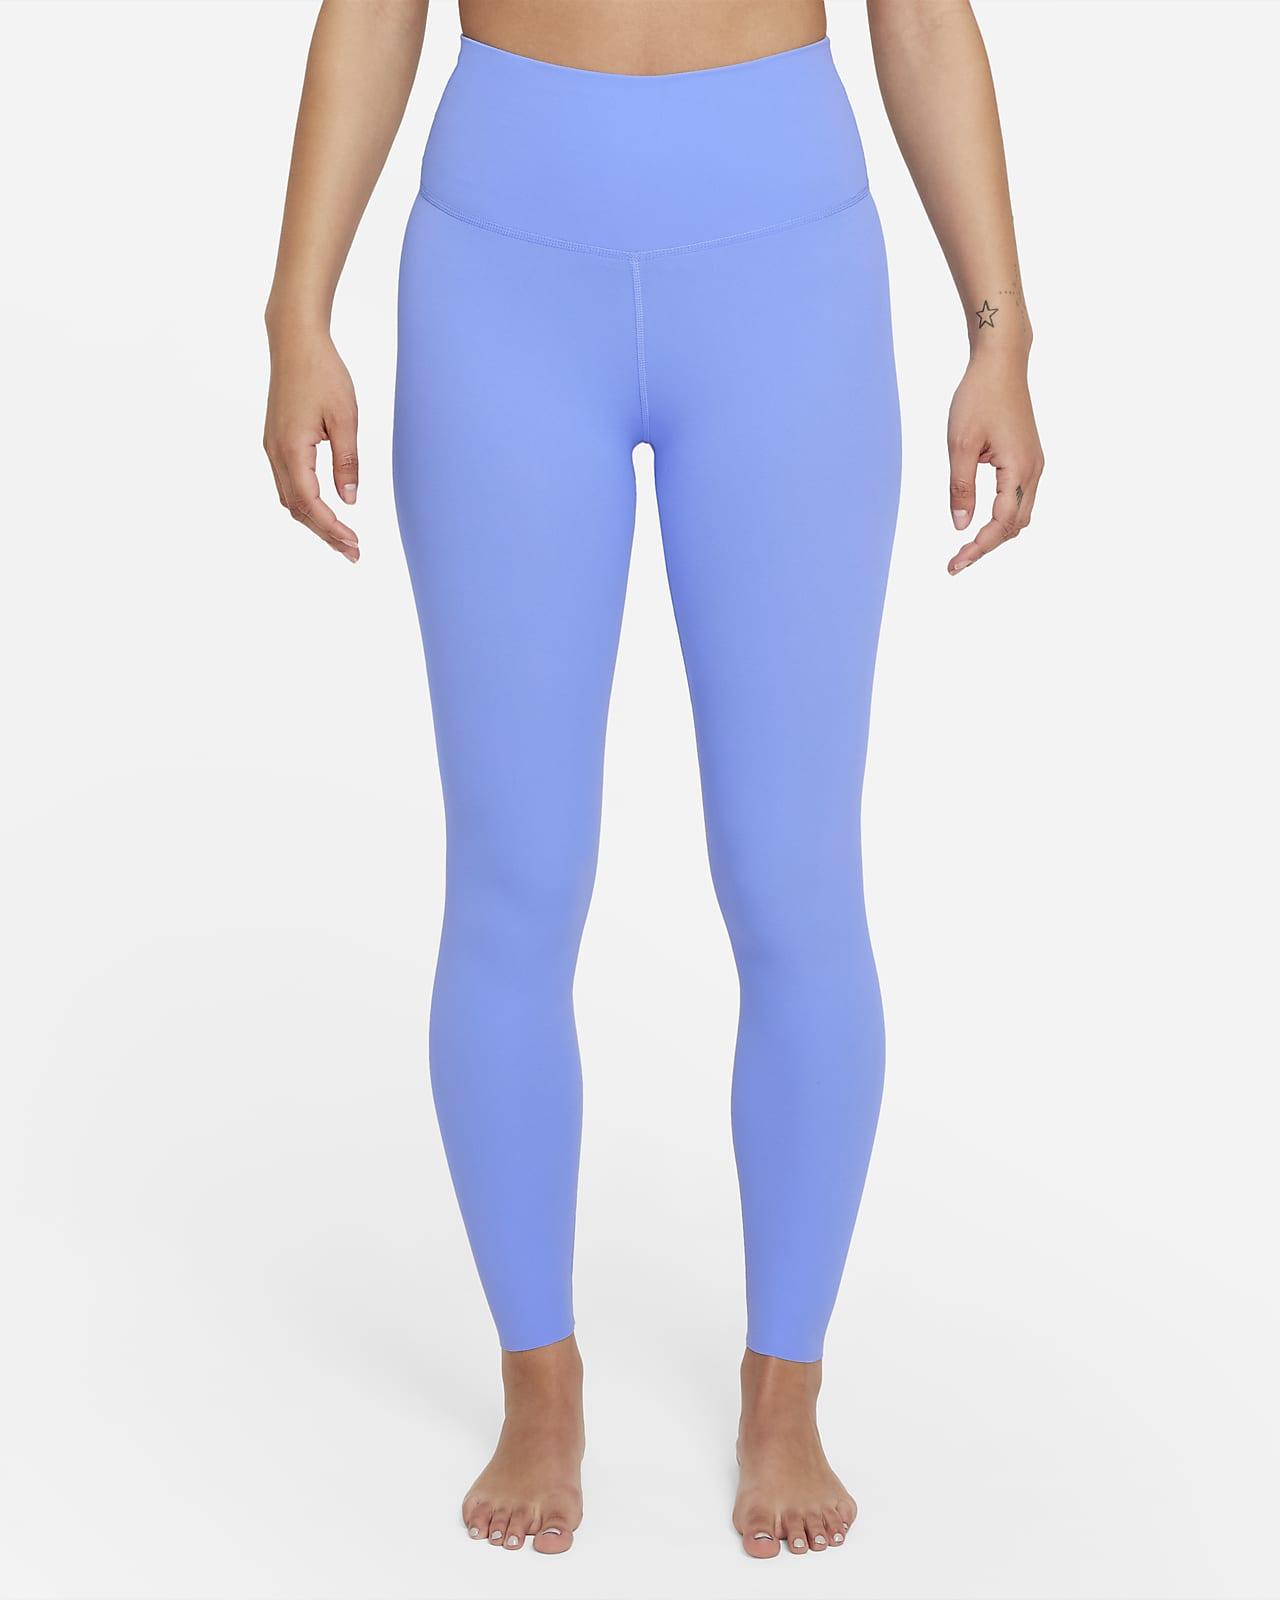 Nike Yoga Luxe Women's High-Waisted 7/8 Infinalon Leggings